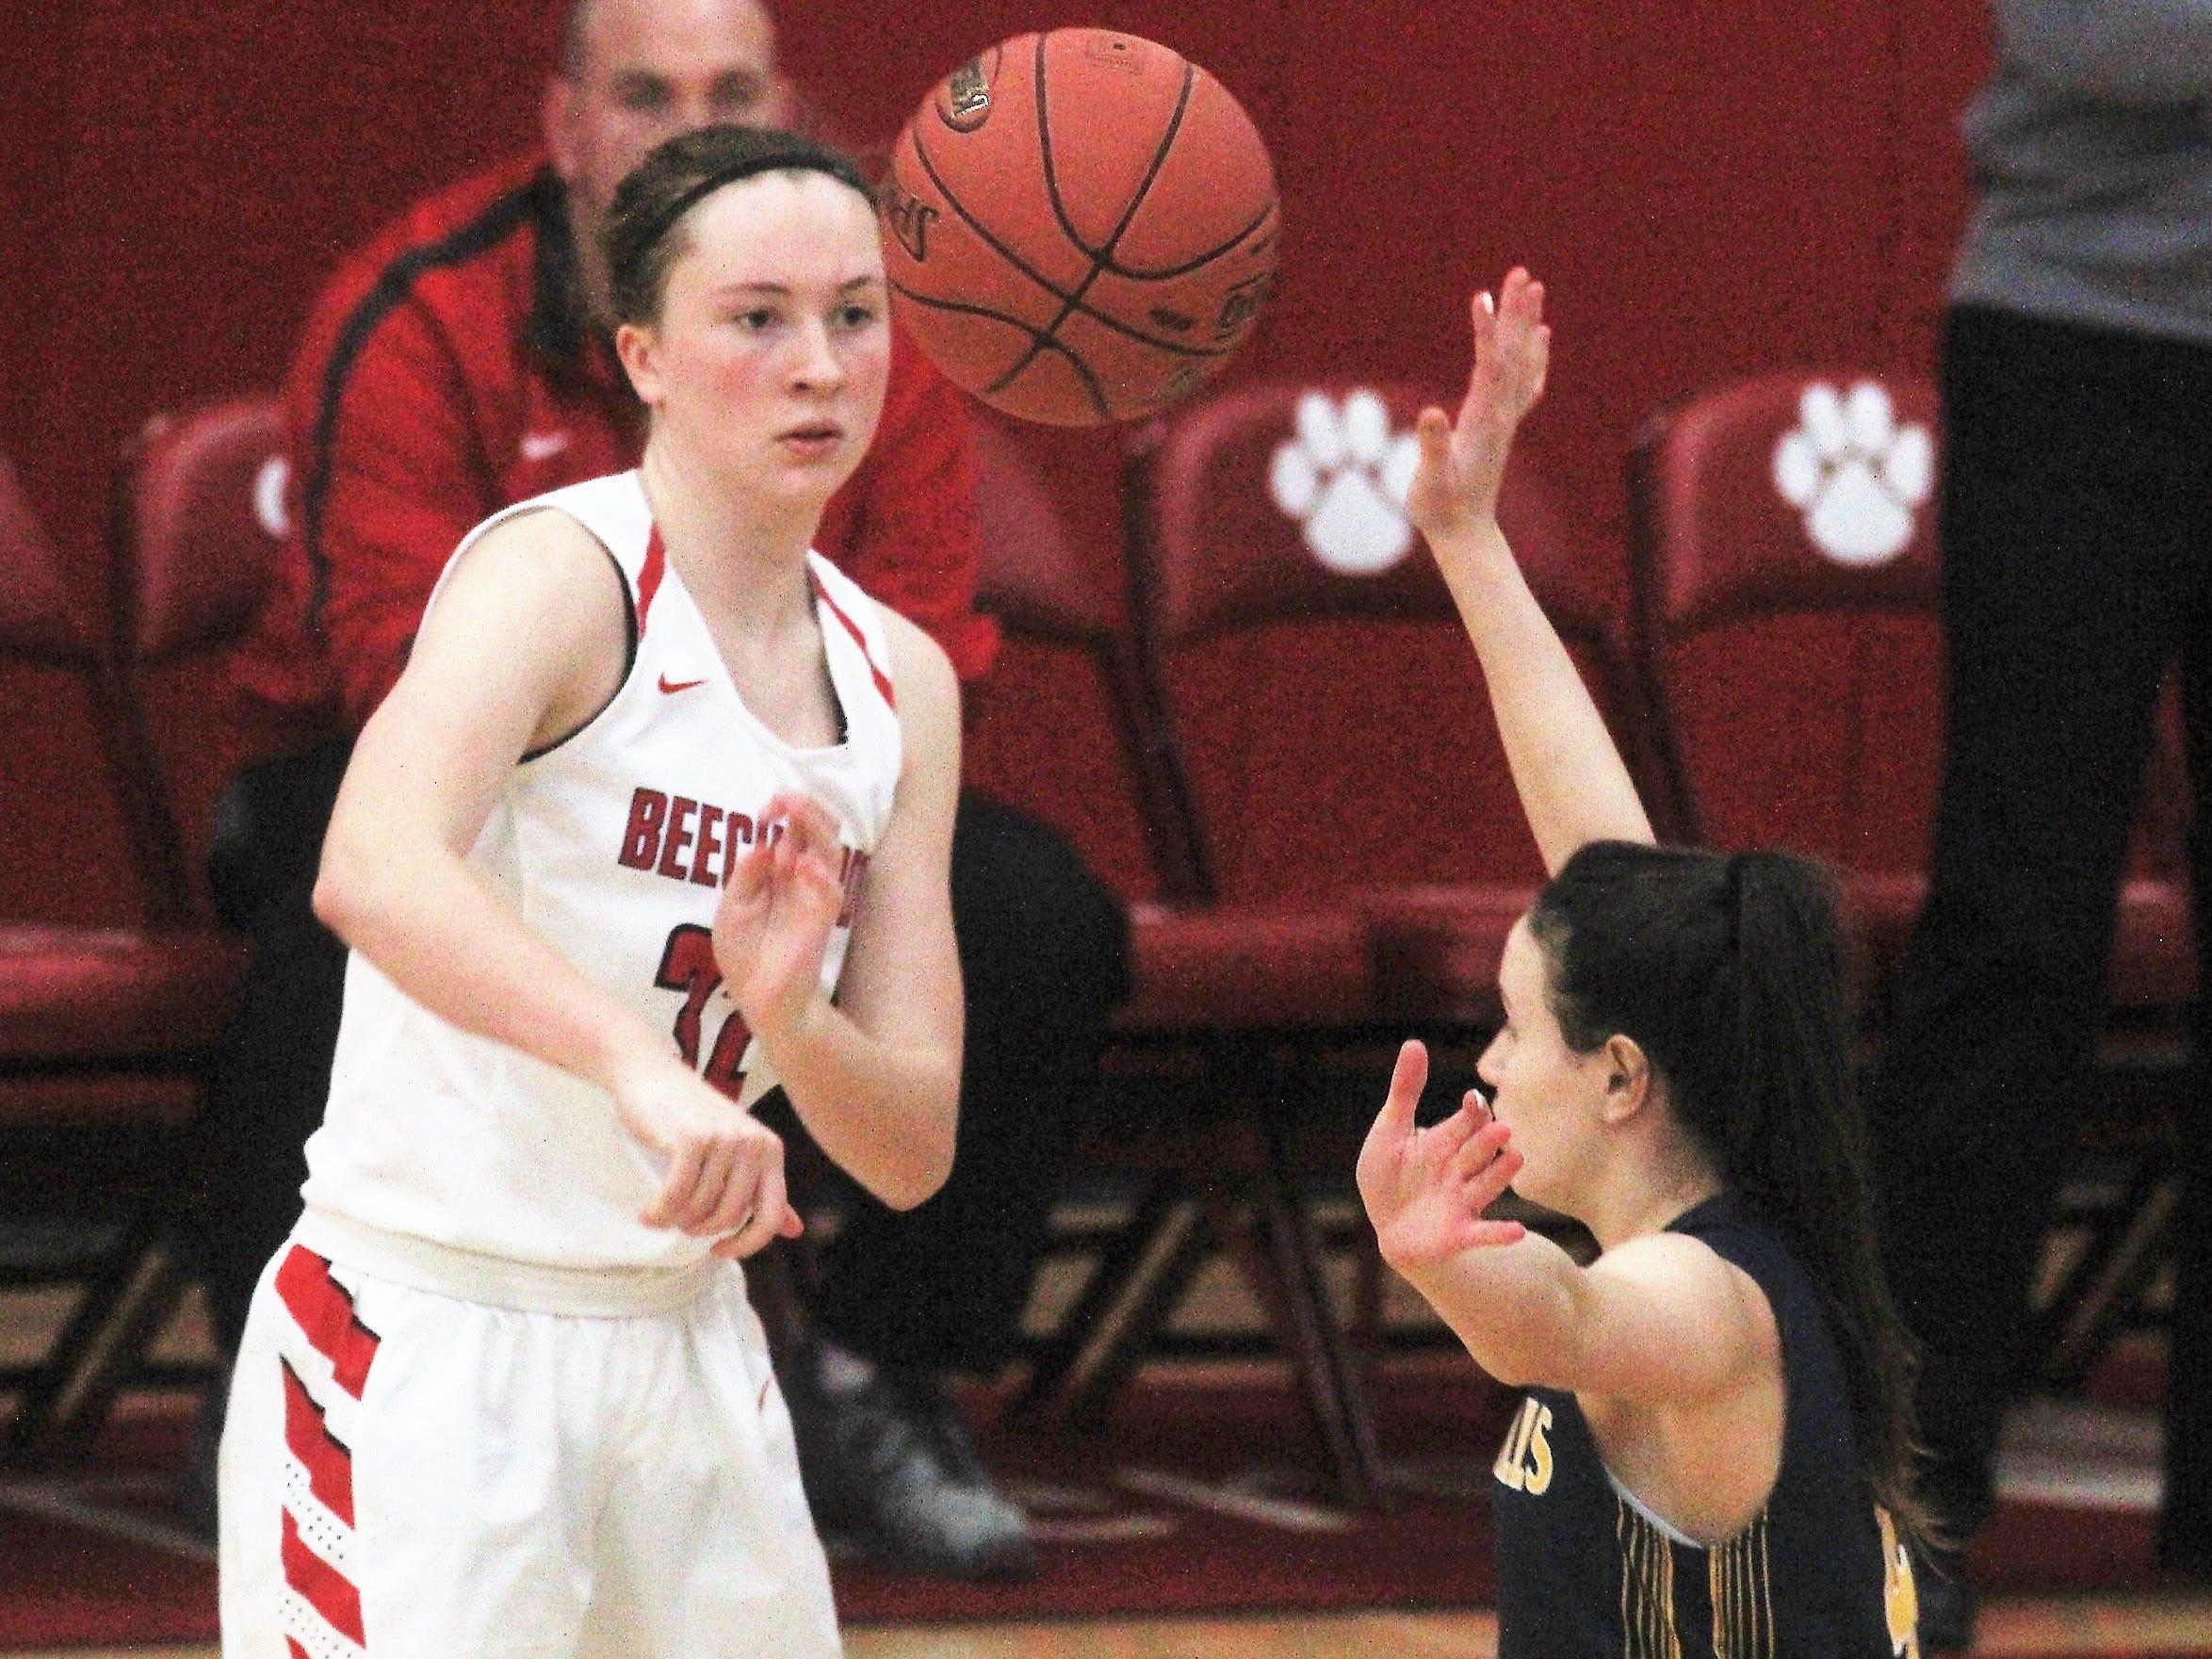 Beechwood sophomore Hanna Mueller passes the ball as Beechwood beat Seven Hills 57-54 in girls basketball Jan. 15, 2019 at Beechwood HS, Fort Mitchell KY.